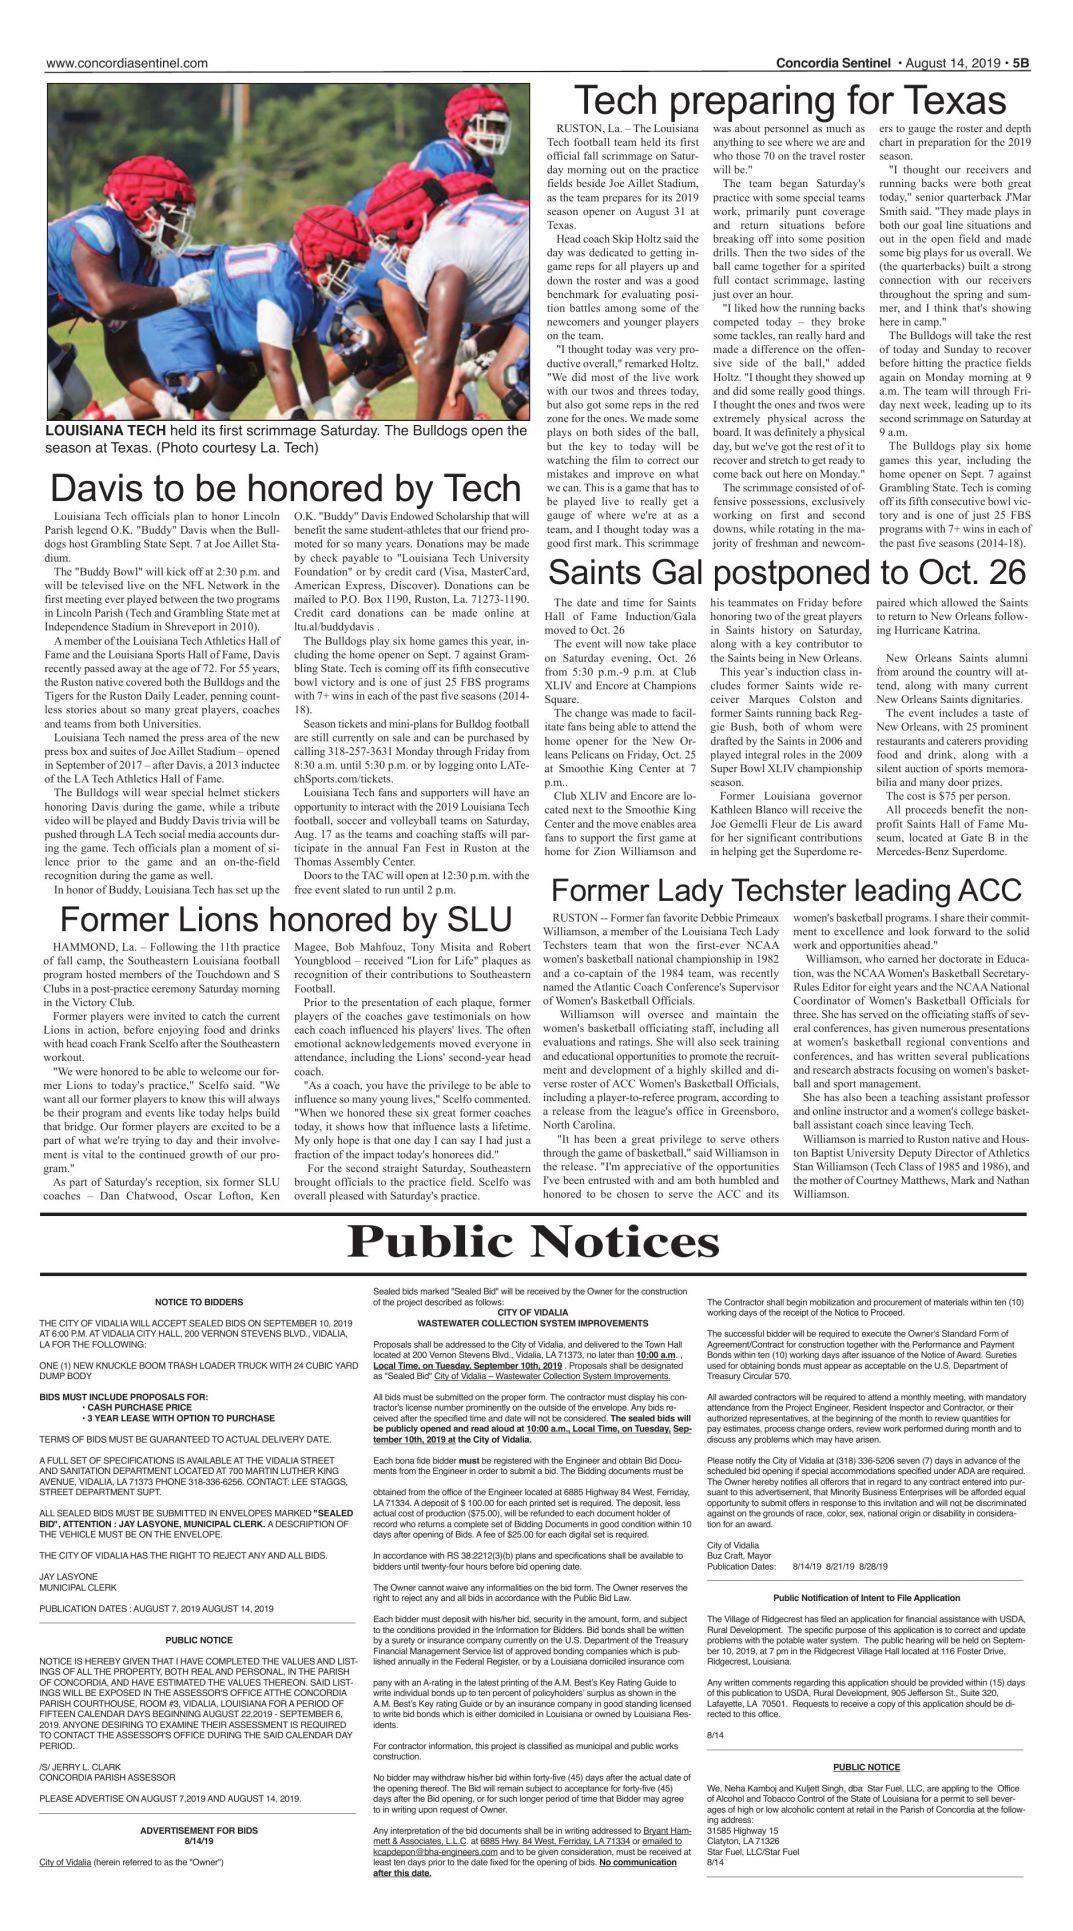 Public Notices - August 14, 2019